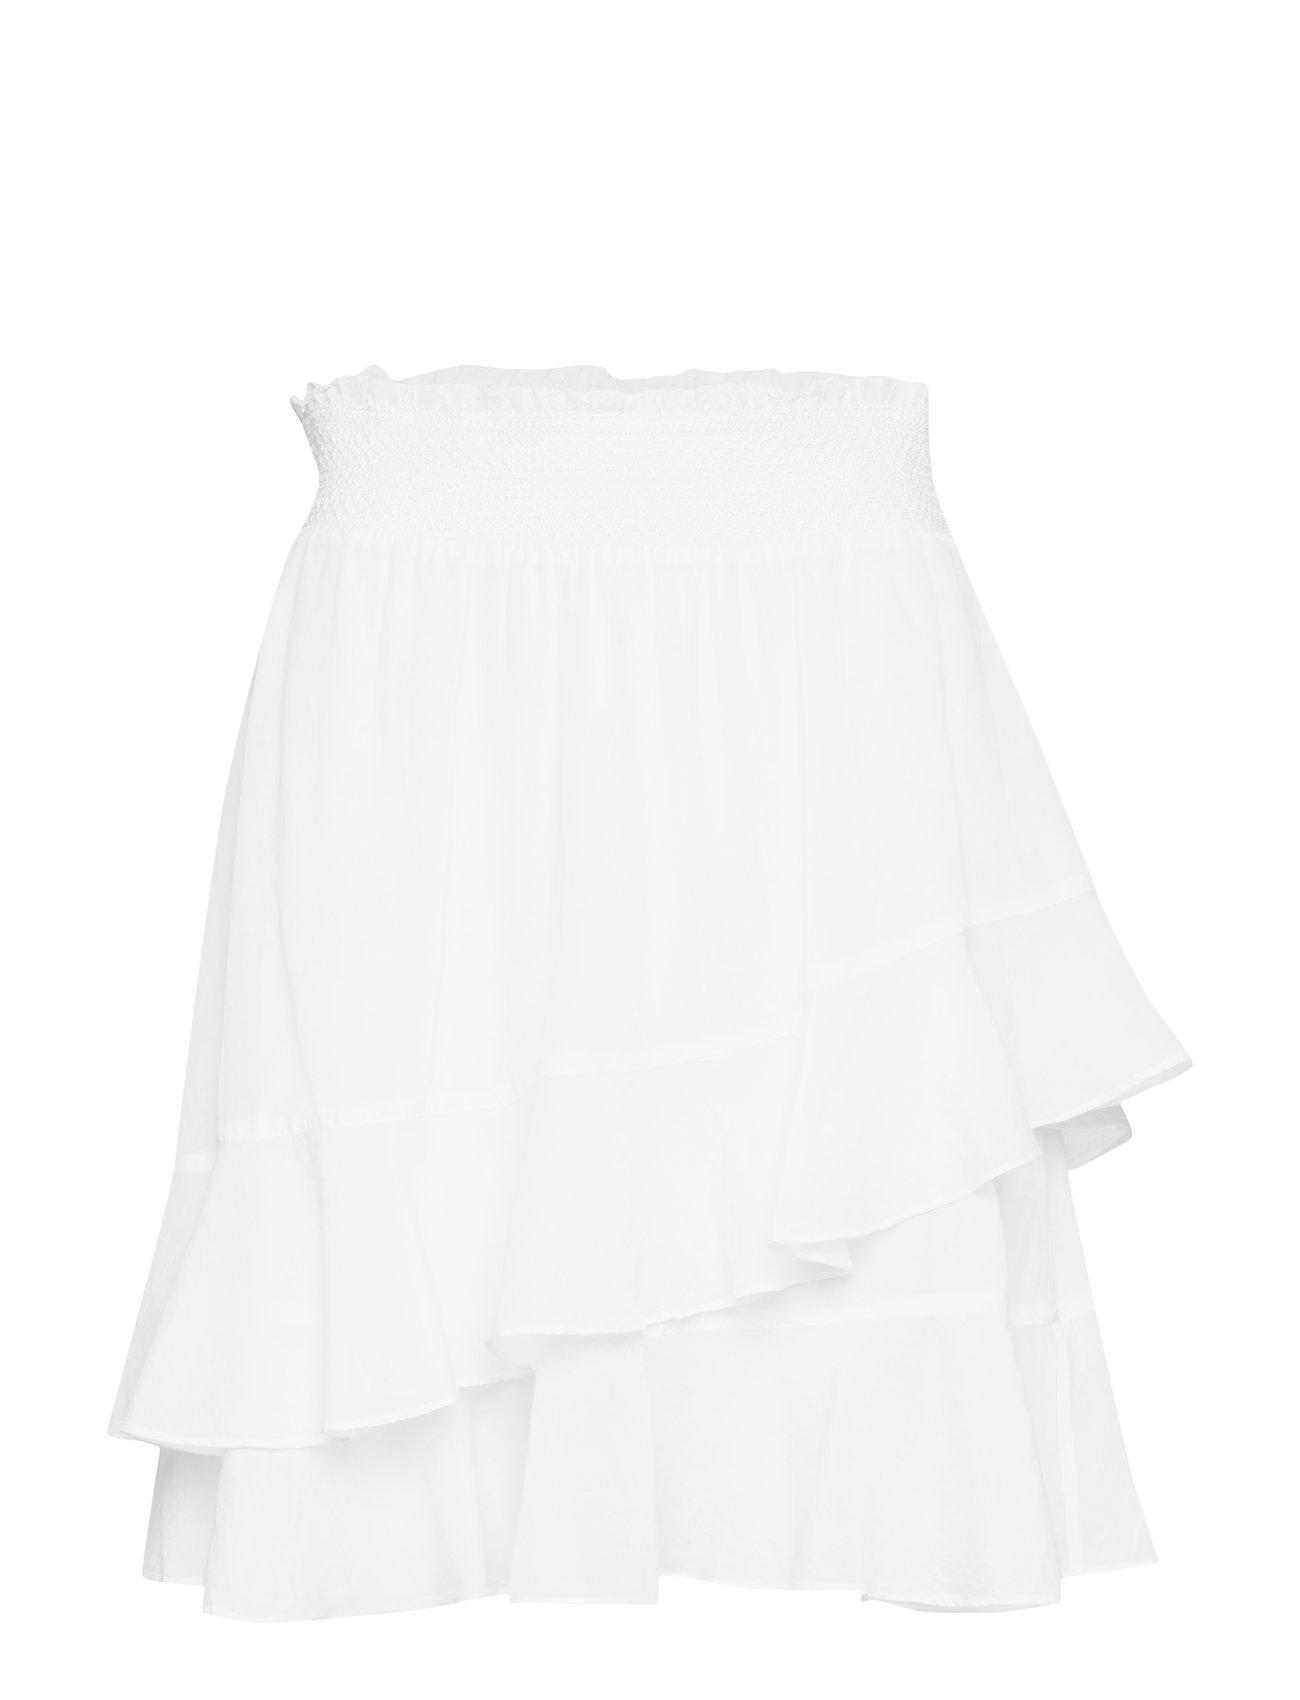 ODD MOLLY majestic skirt - LIGHT CHALK